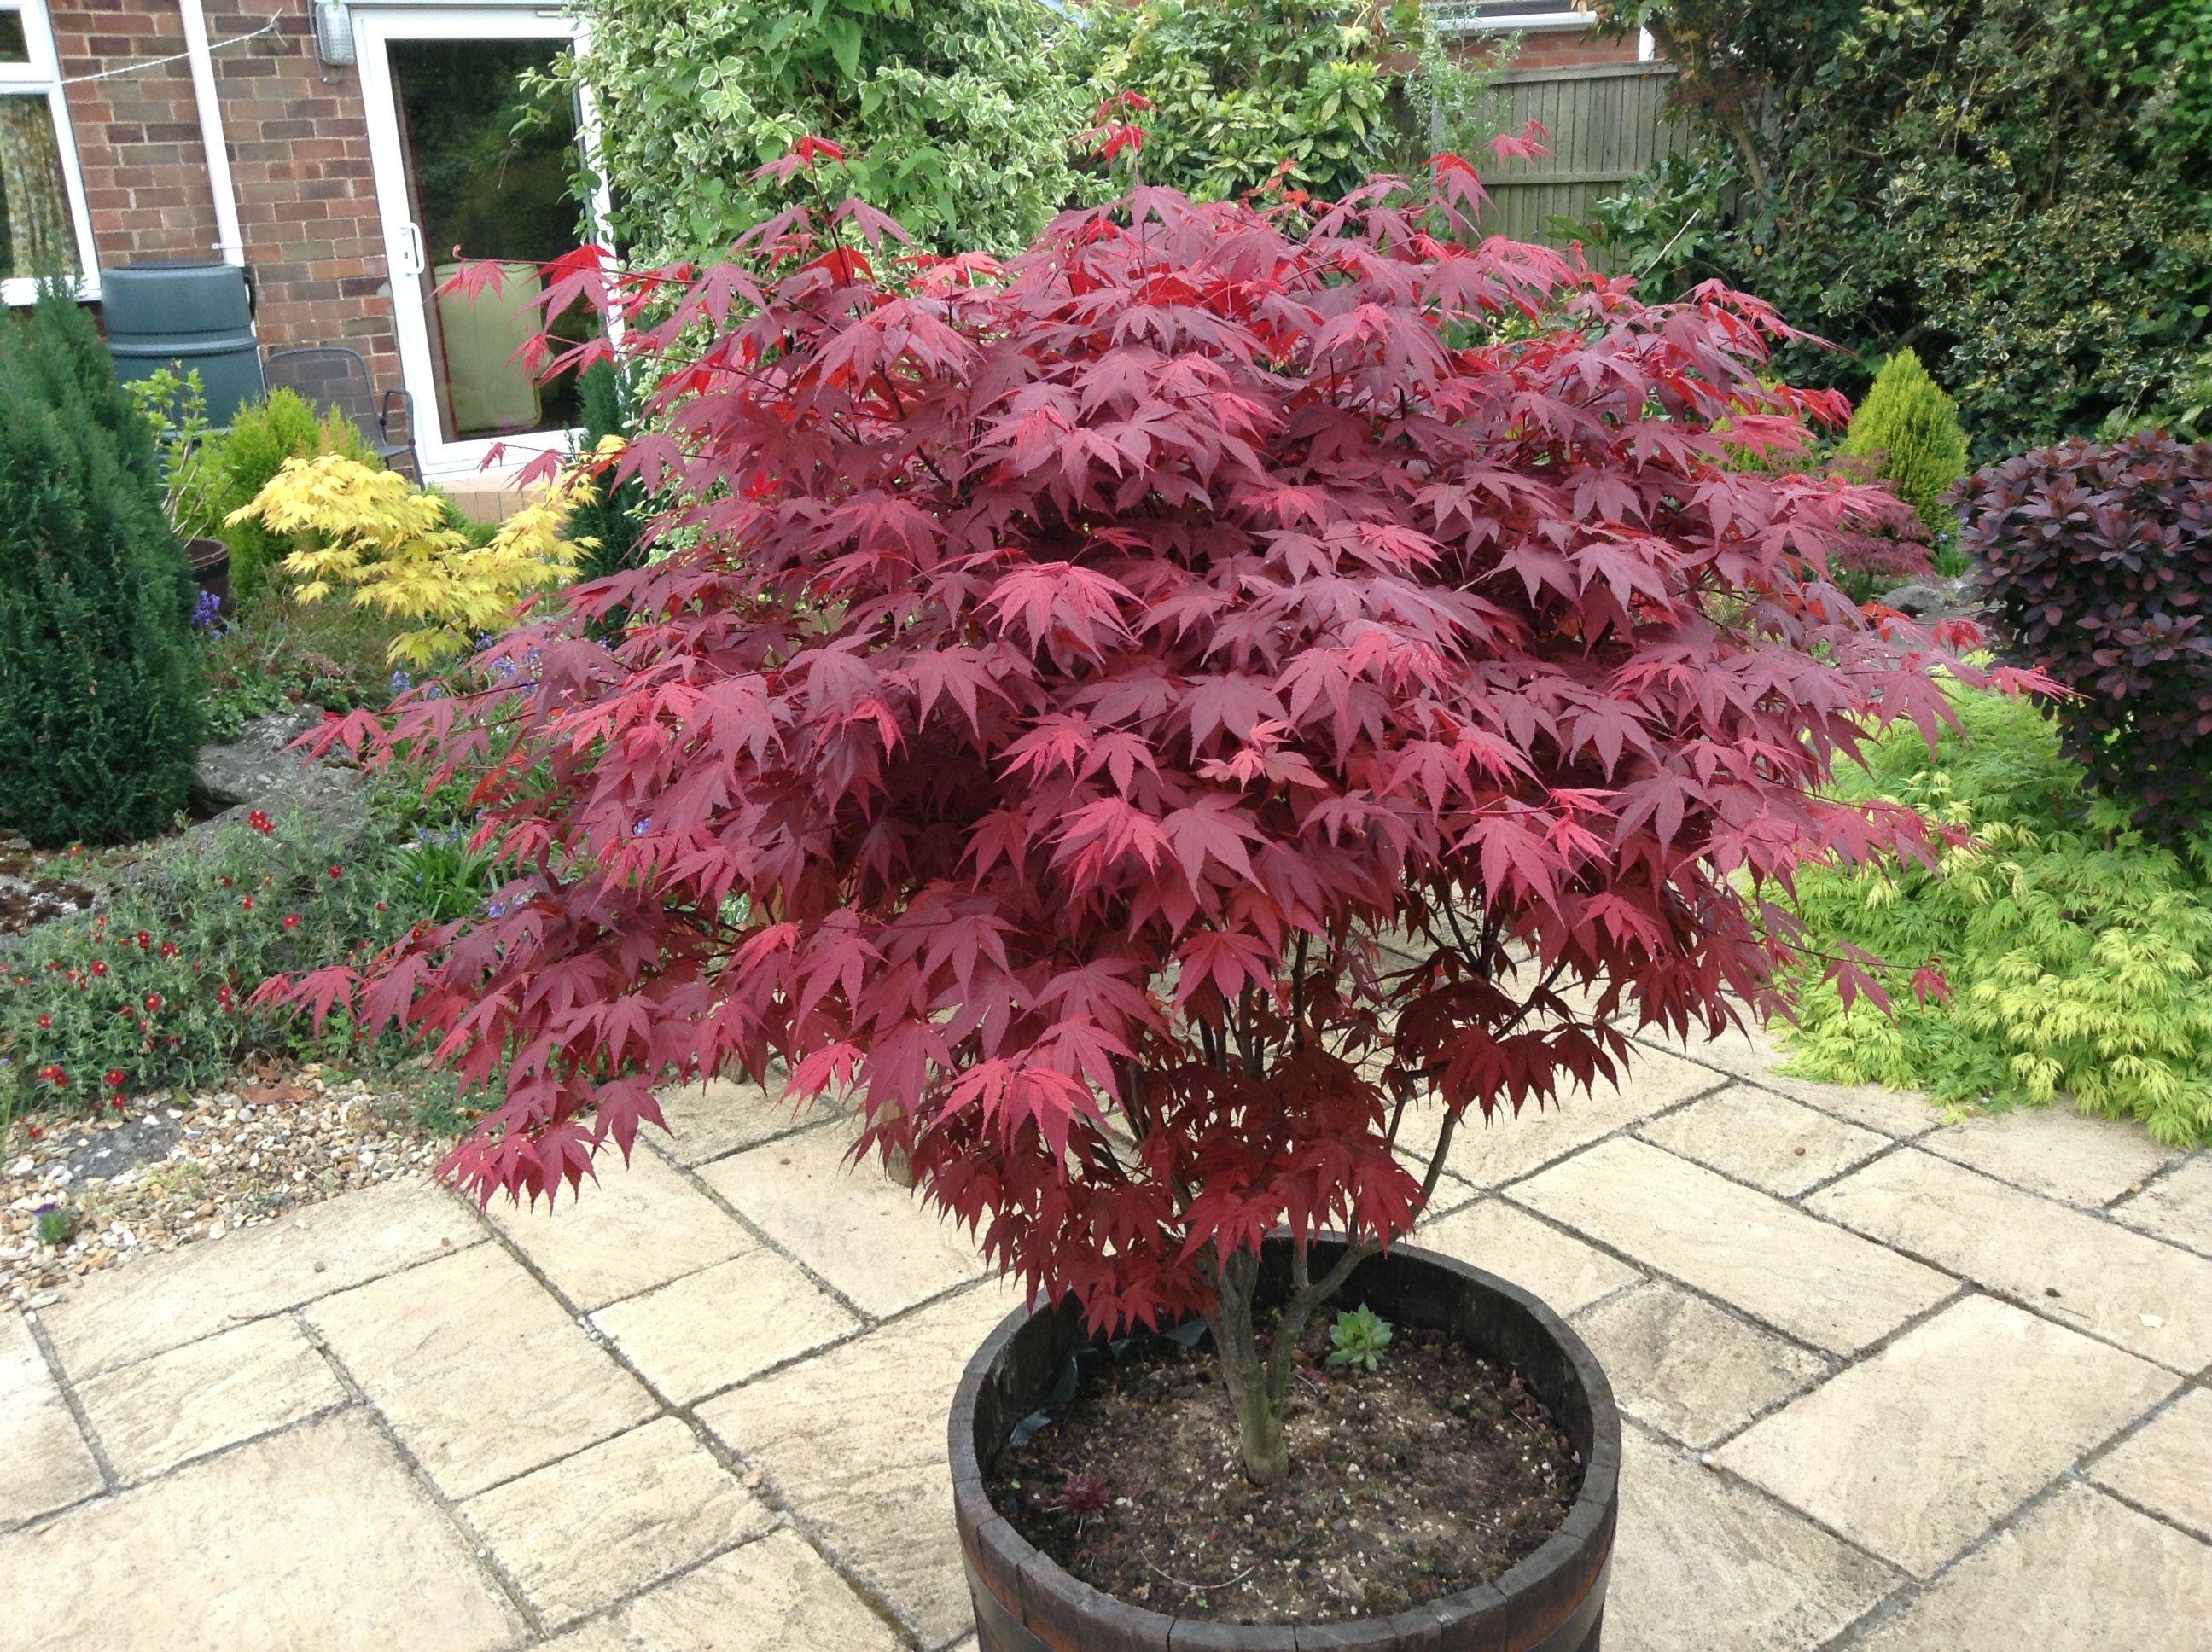 How to care for a fern leaf japanese maple - Acer Palmatum Atropurpureum Dwarf Japanese Maple